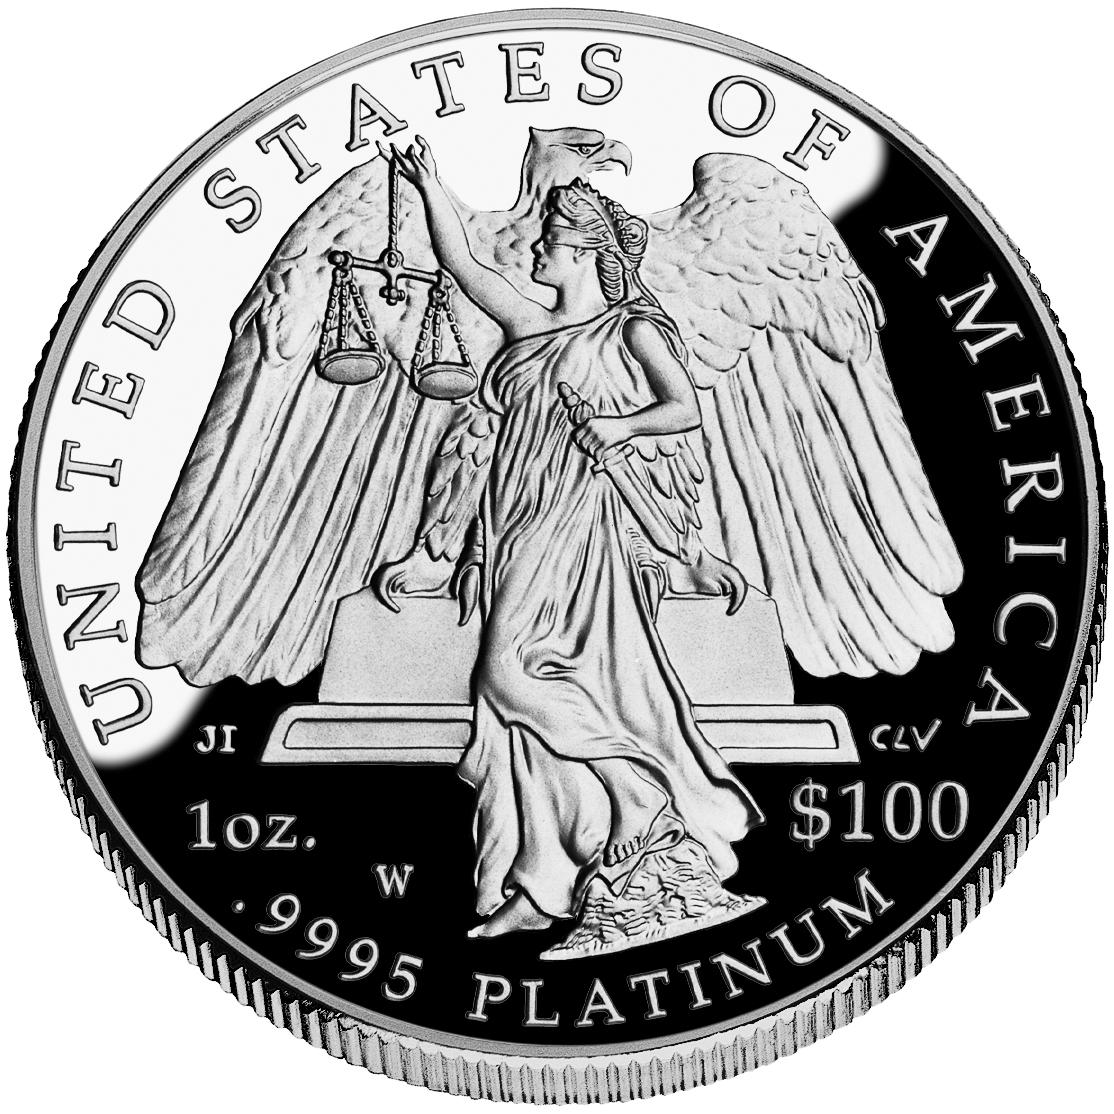 2020 S AMERICAN EAGLE SILVER Dollar PROOF SanFrancisco US MINT Gift 1oz 999 20EM